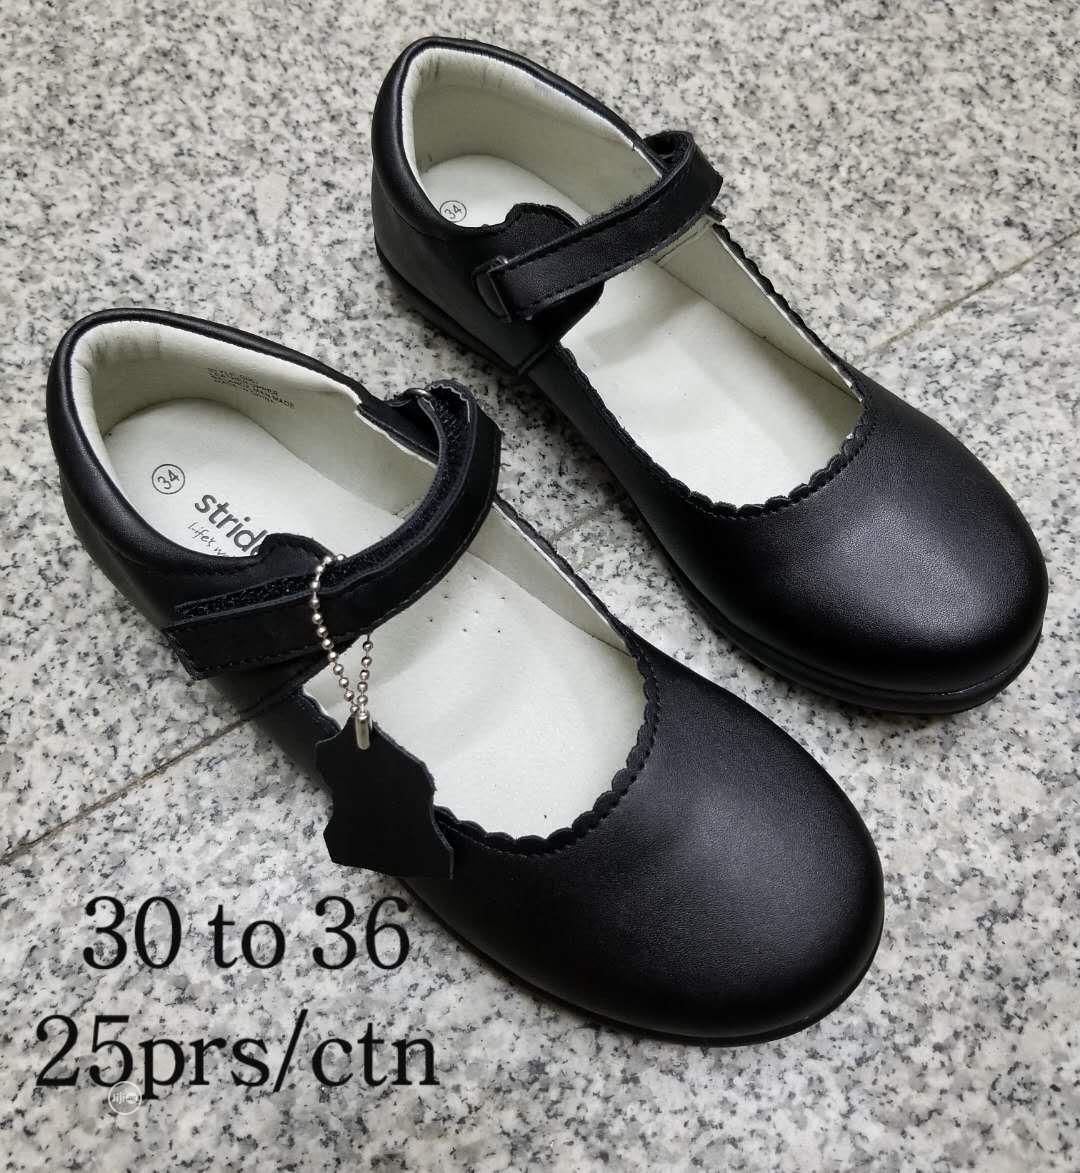 Stride Rite School Shoes in Lagos